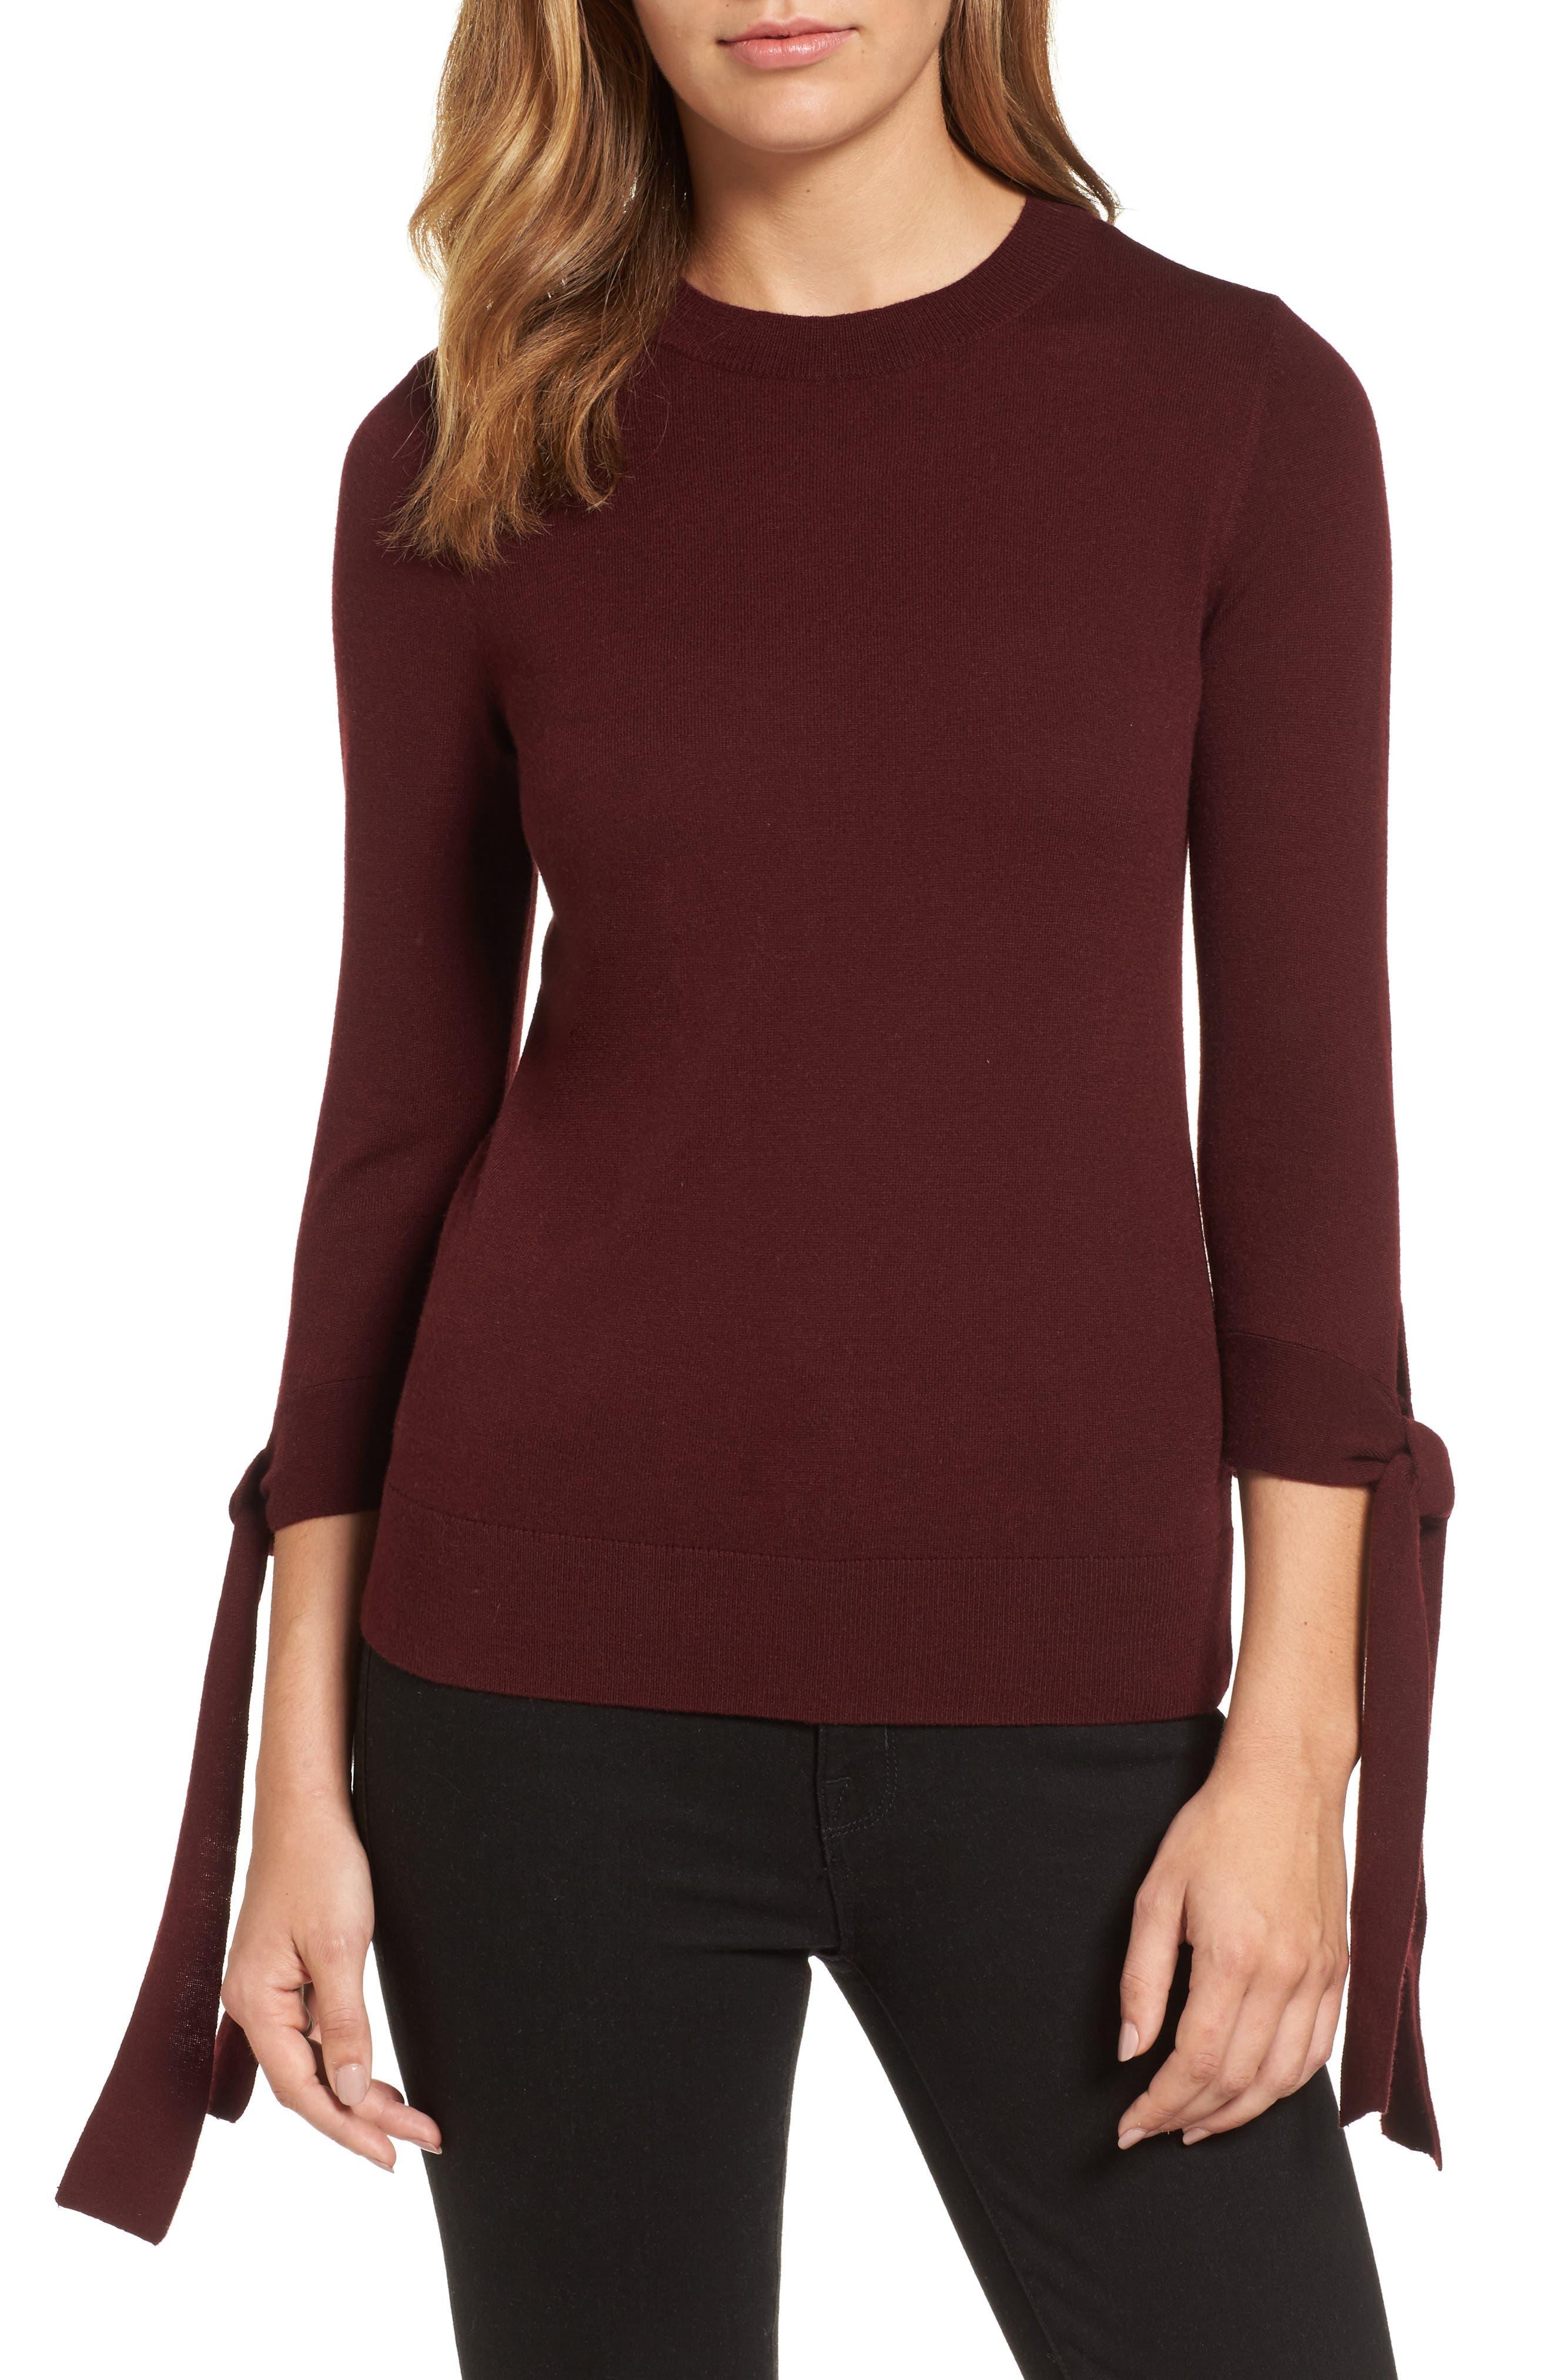 Alternate Image 1 Selected - Halogen® Tie Sleeve Crewneck Sweater (Regular & Petite)